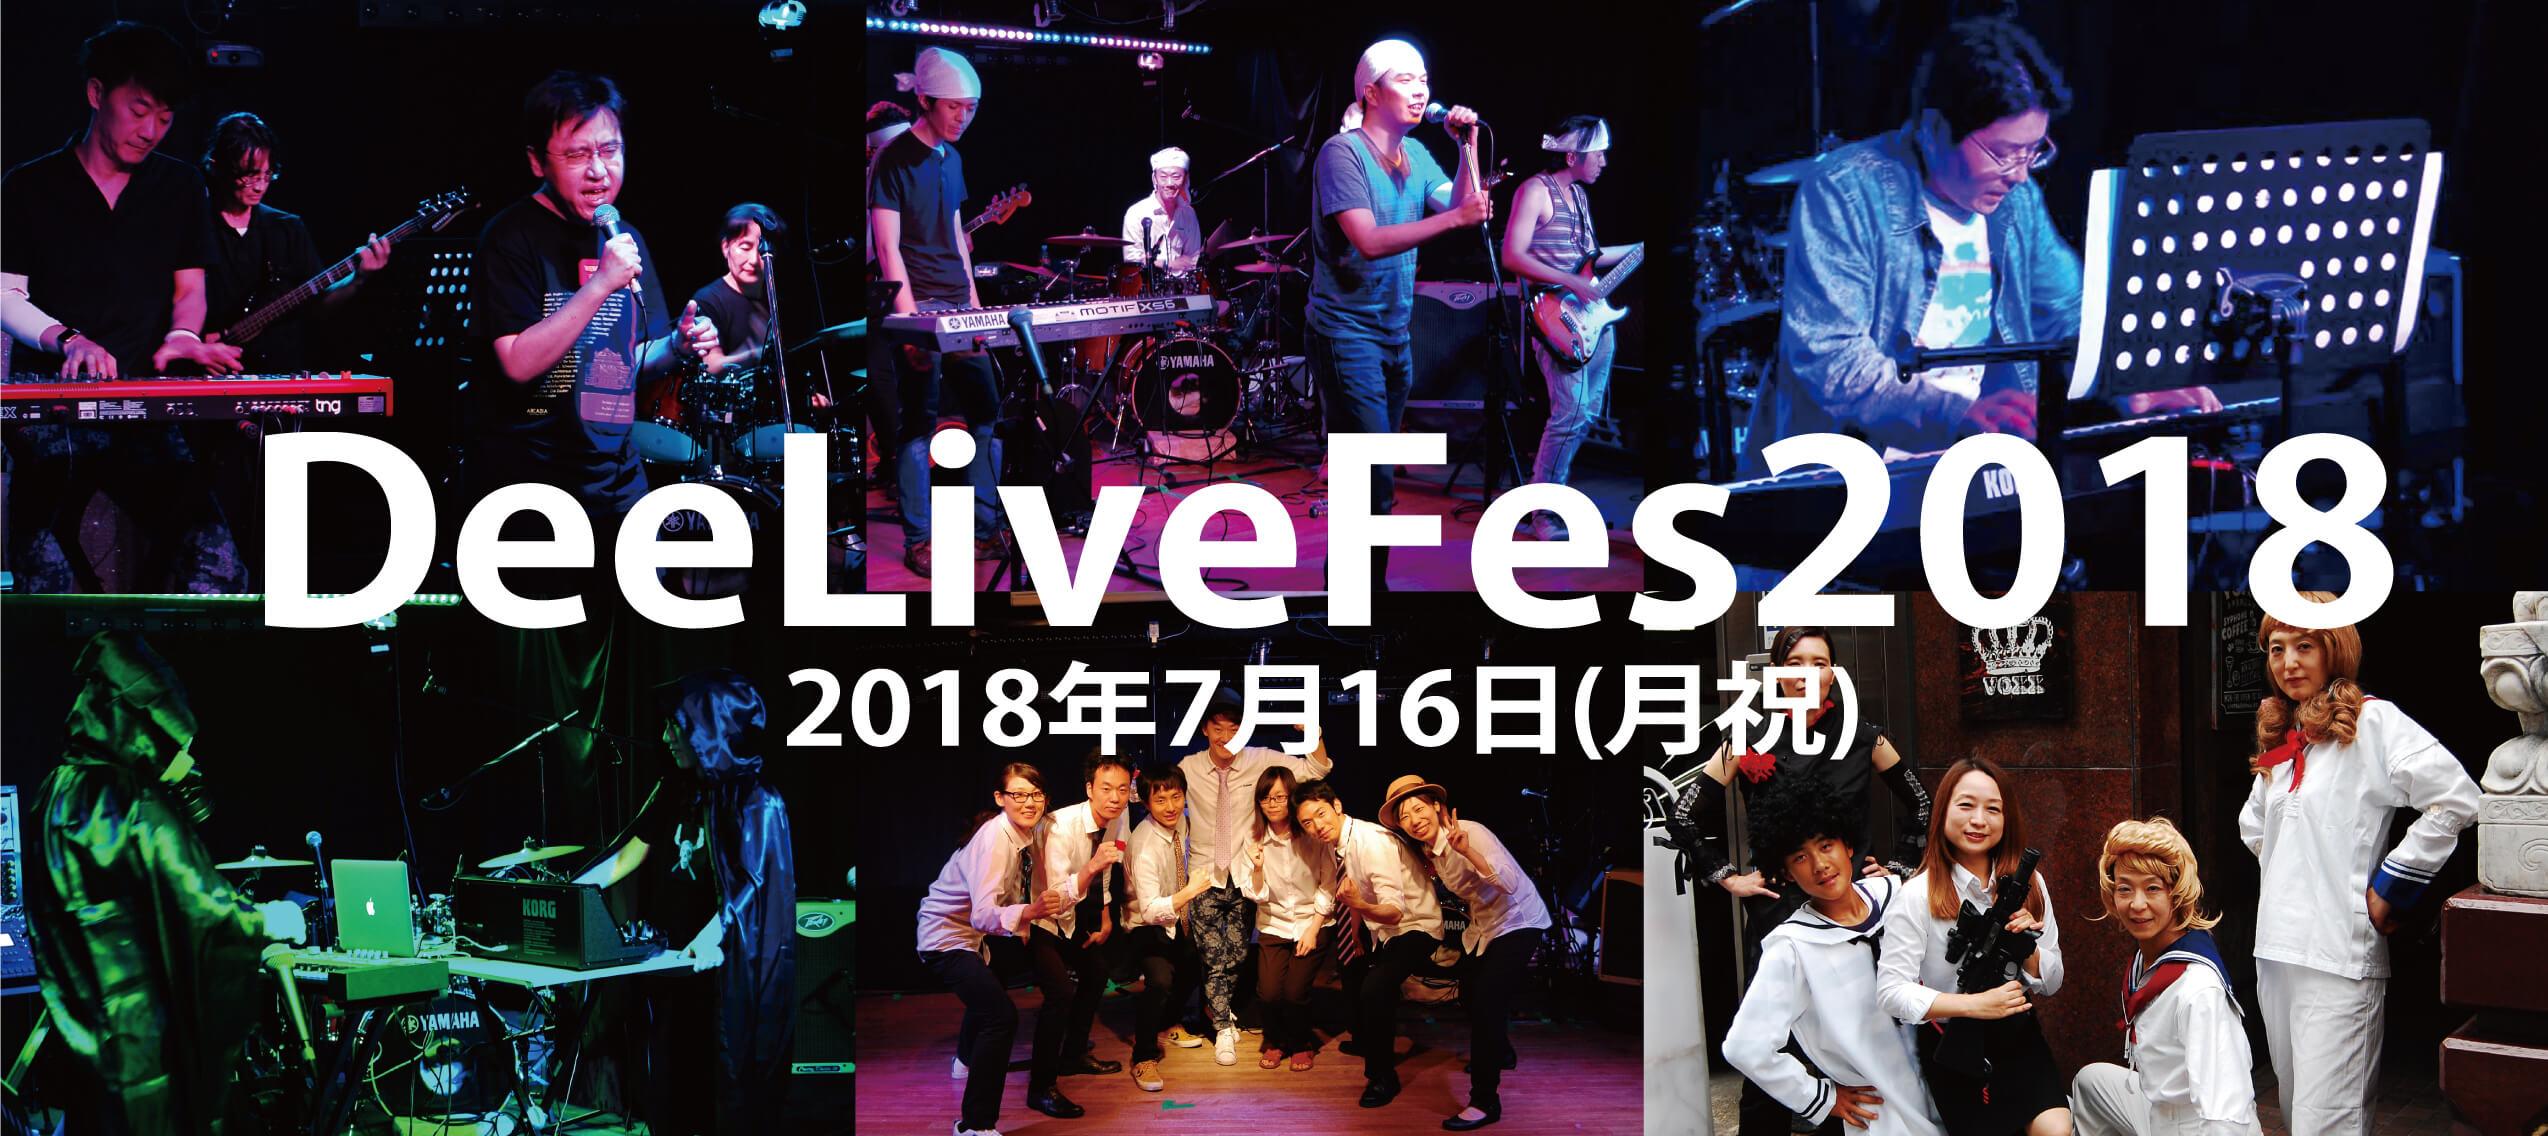 DTMスクール 大阪 ライブ発表会